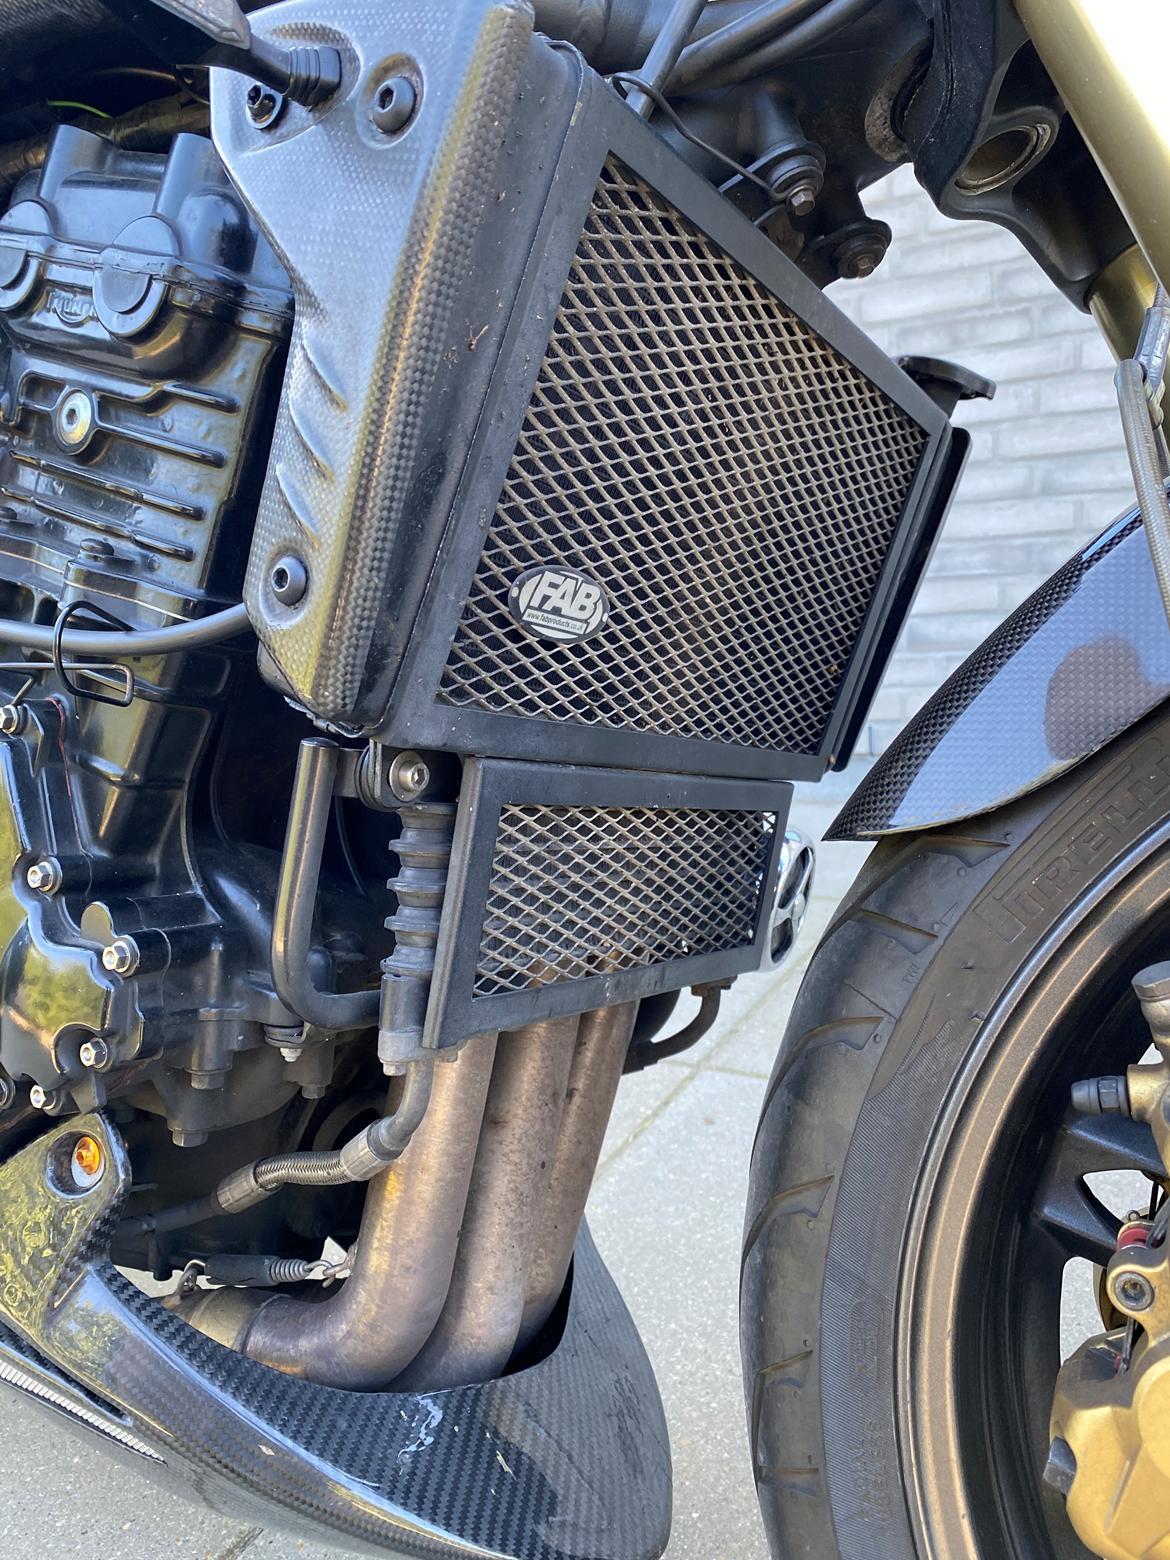 Triumph Speed Triple (SOLGT) billede 36